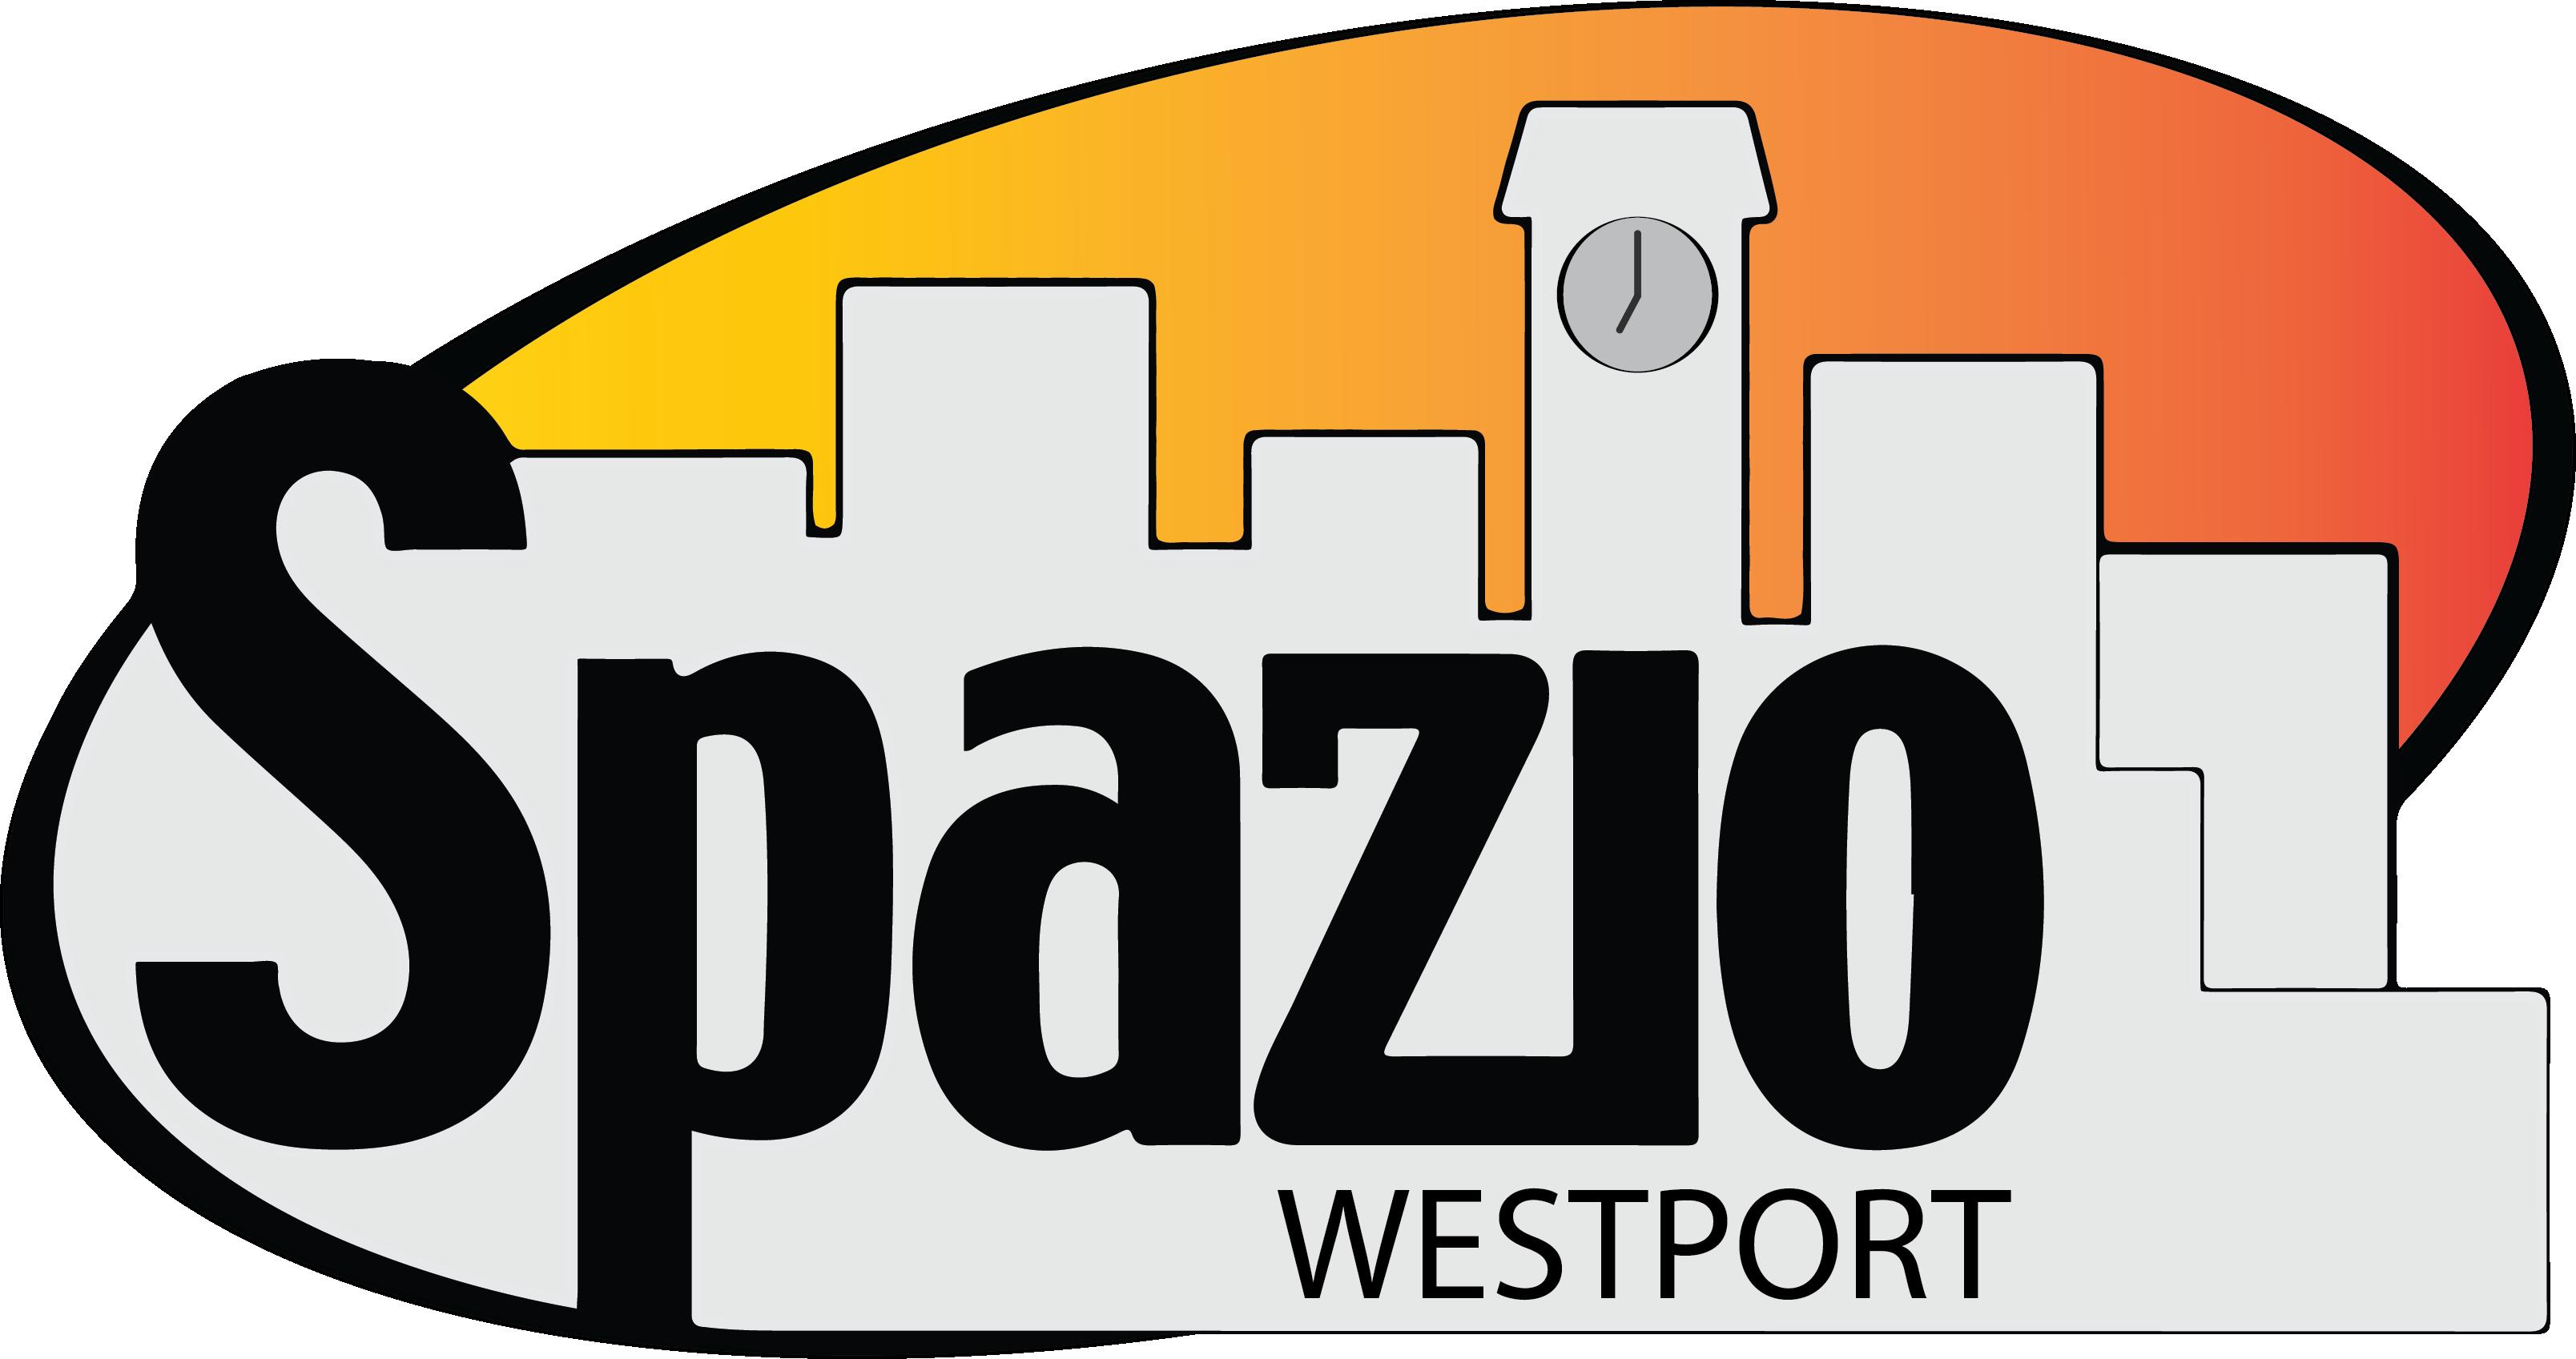 Spazio Westport Logo